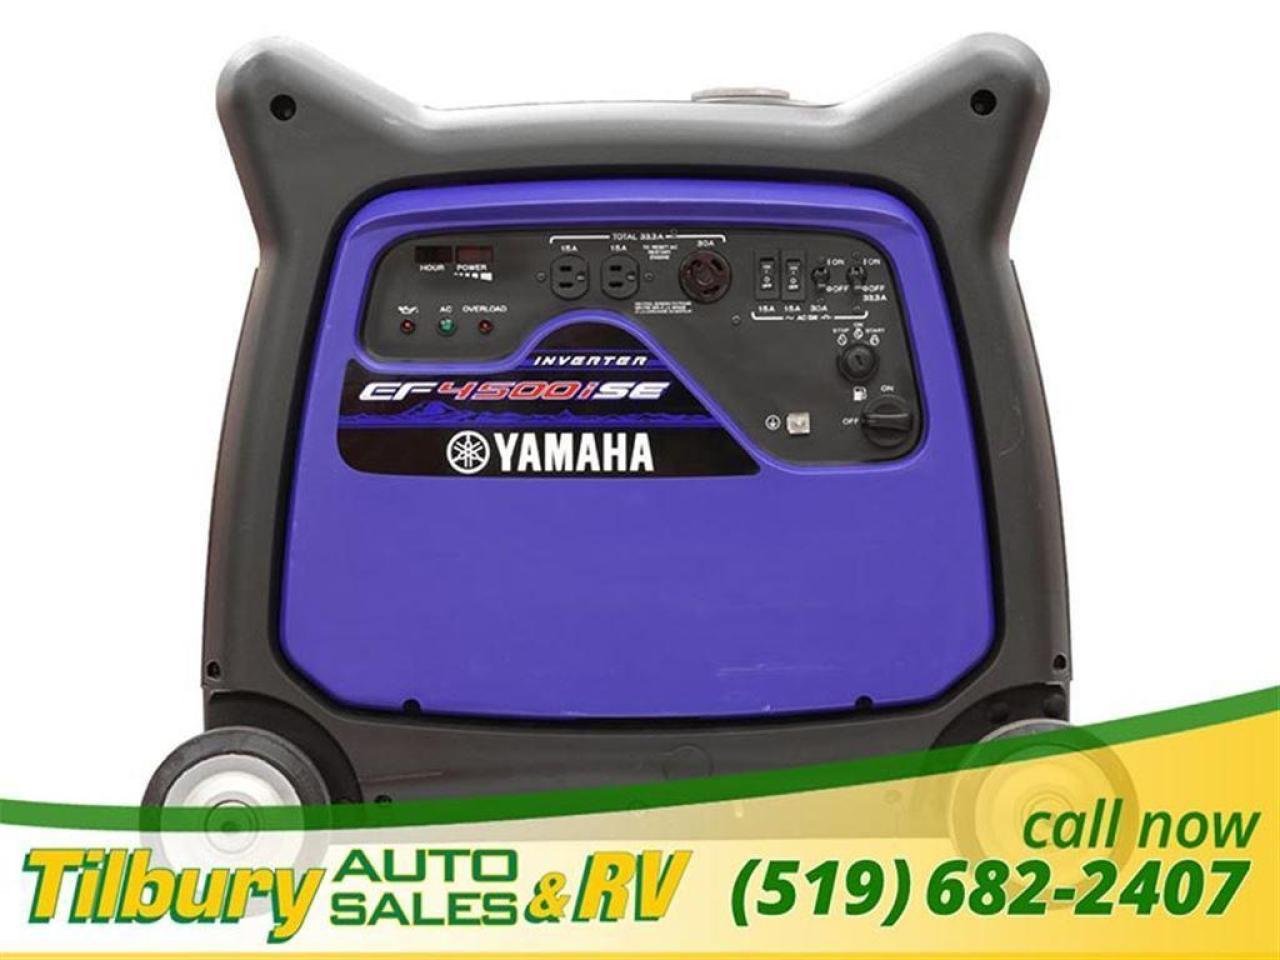 2018 Yamaha EF4500iSE GENERATOR. 1 IN STOCK.